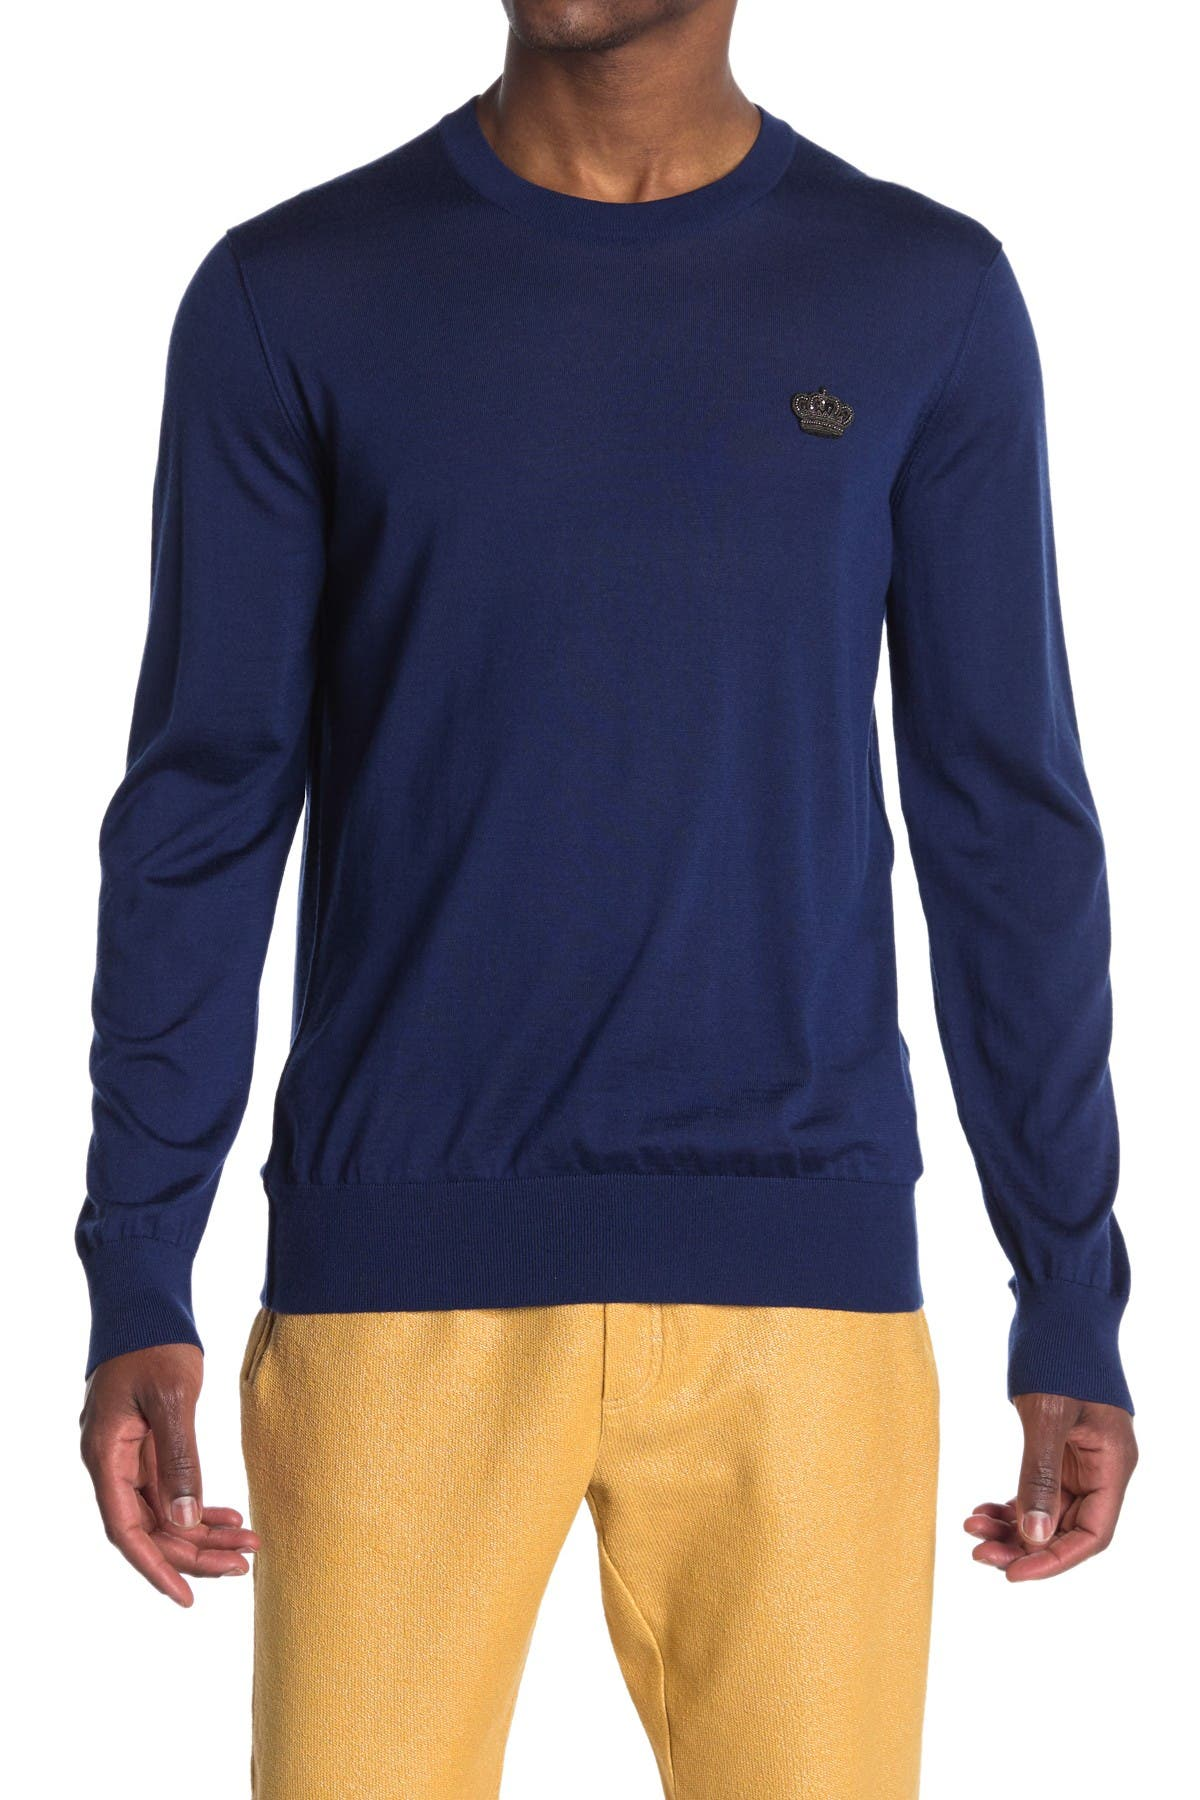 Image of Dolce & Gabbana Long Sleeve Cashmere Shirt